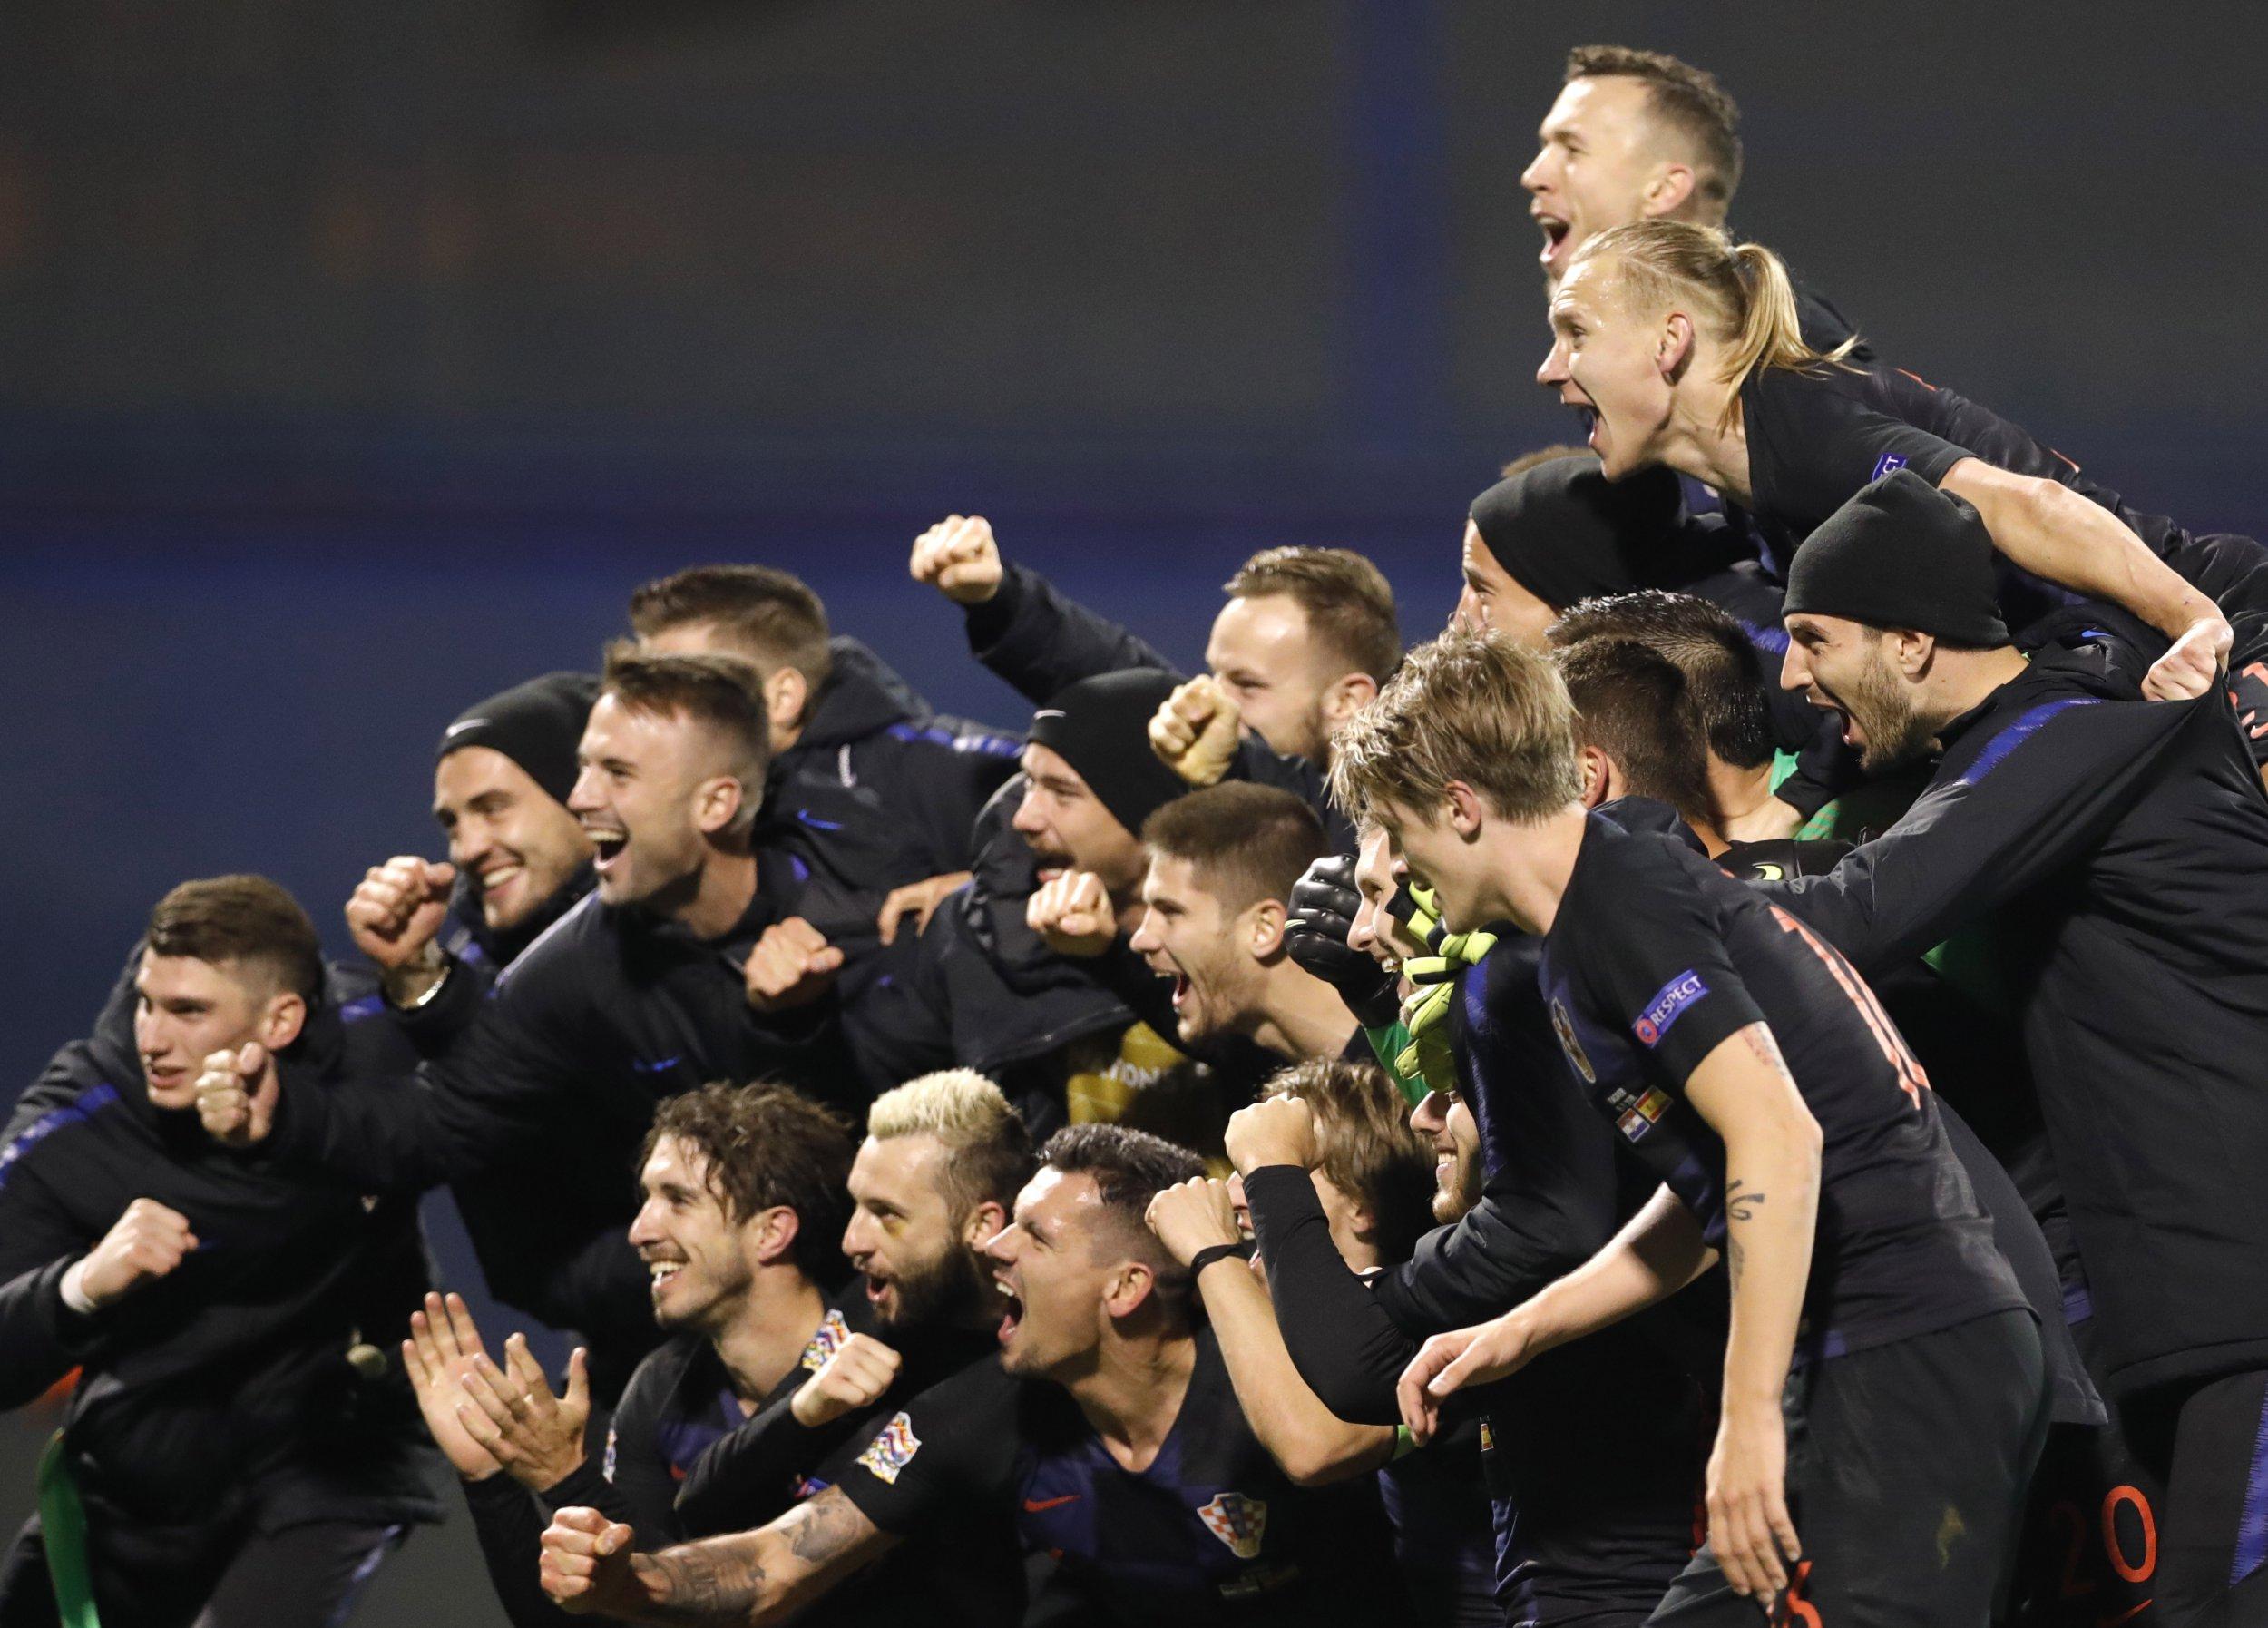 epa07168179 Croatia's soccer players celebrate winning against Spain during the UEFA Nations League' A Group group 4 soccer match between Croatia and Spain at Maksimir stadium in Zagreb, Croatia, 15 October 2018. EPA/ANTONIO BAT